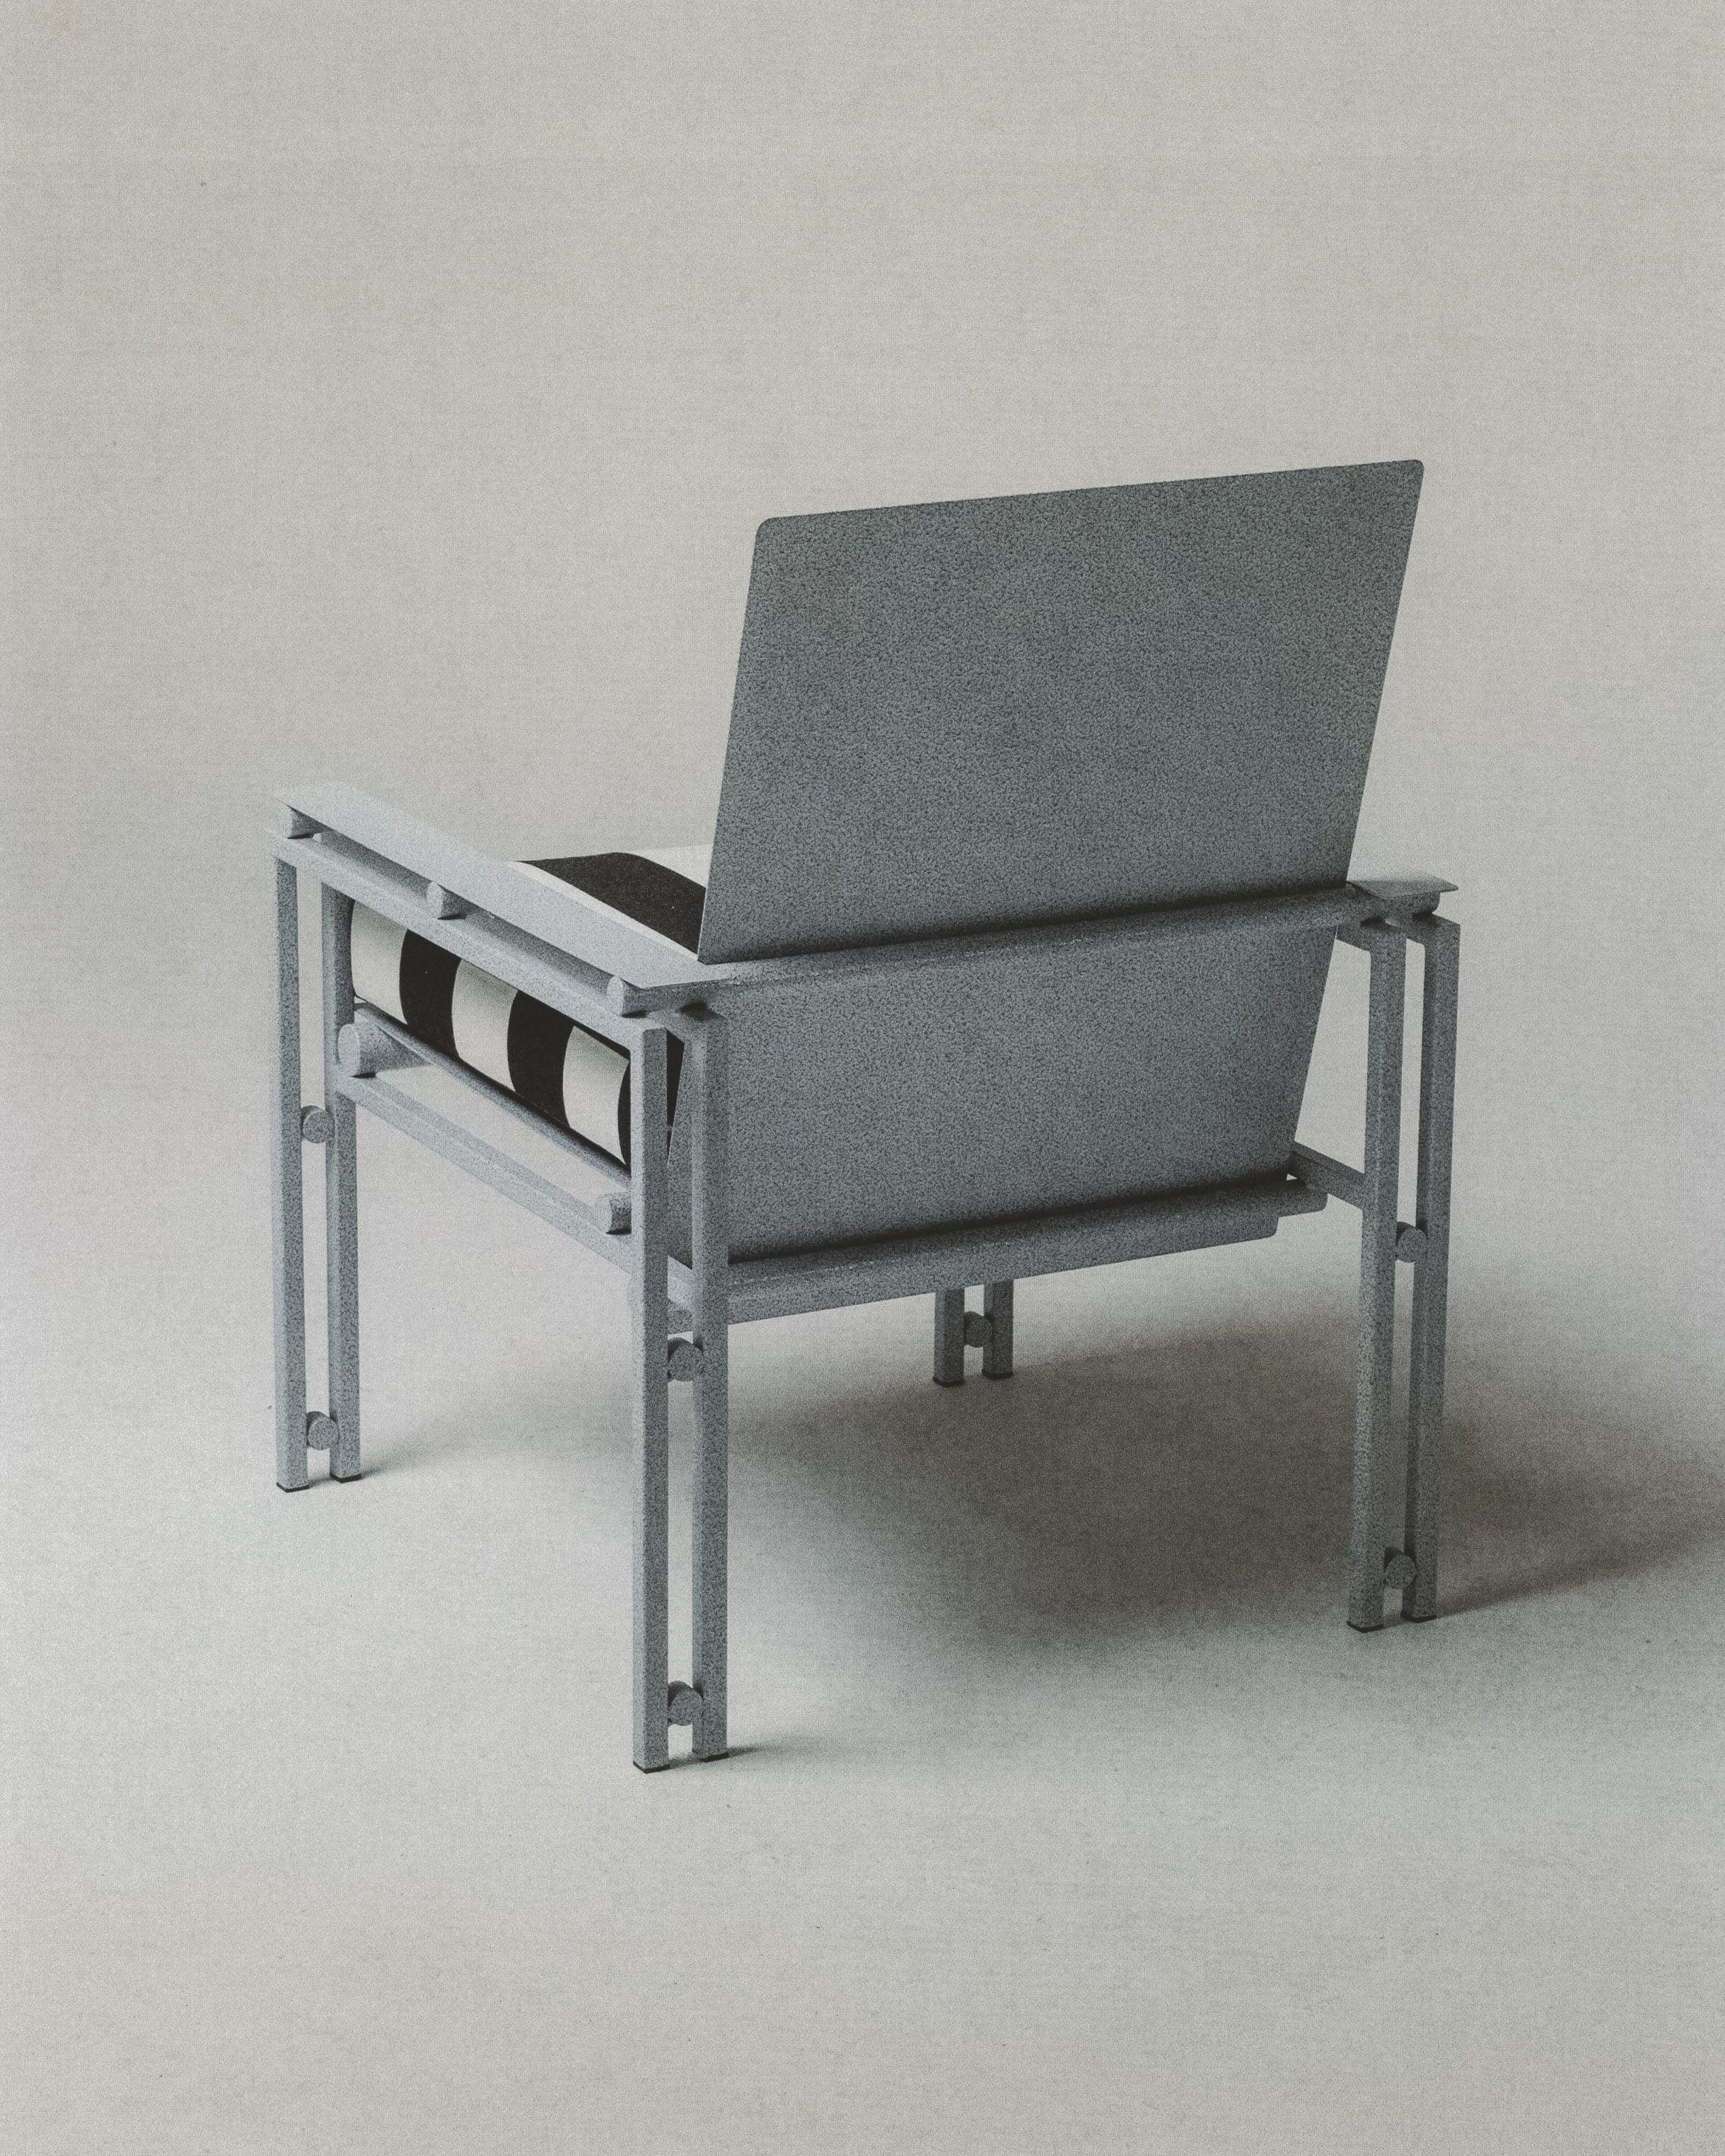 Suspension Metal Lounge product image 3